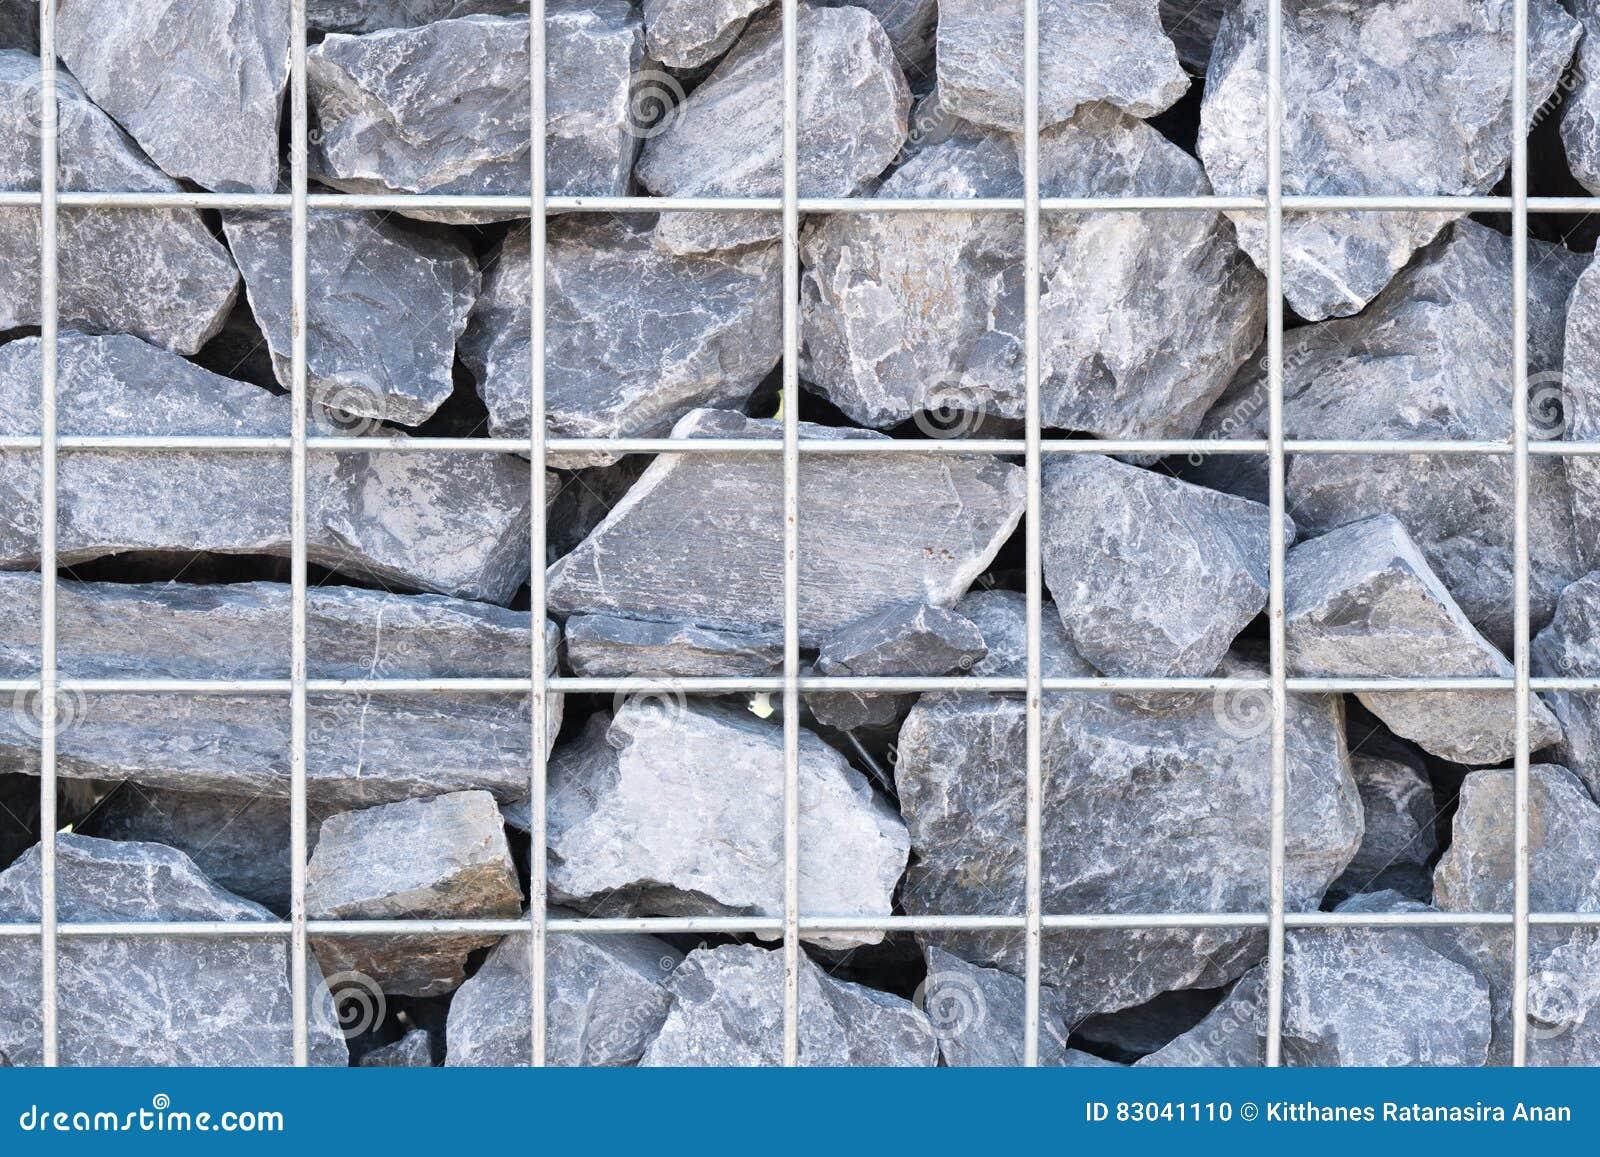 mur de gabion stock images download 204 photos. Black Bedroom Furniture Sets. Home Design Ideas